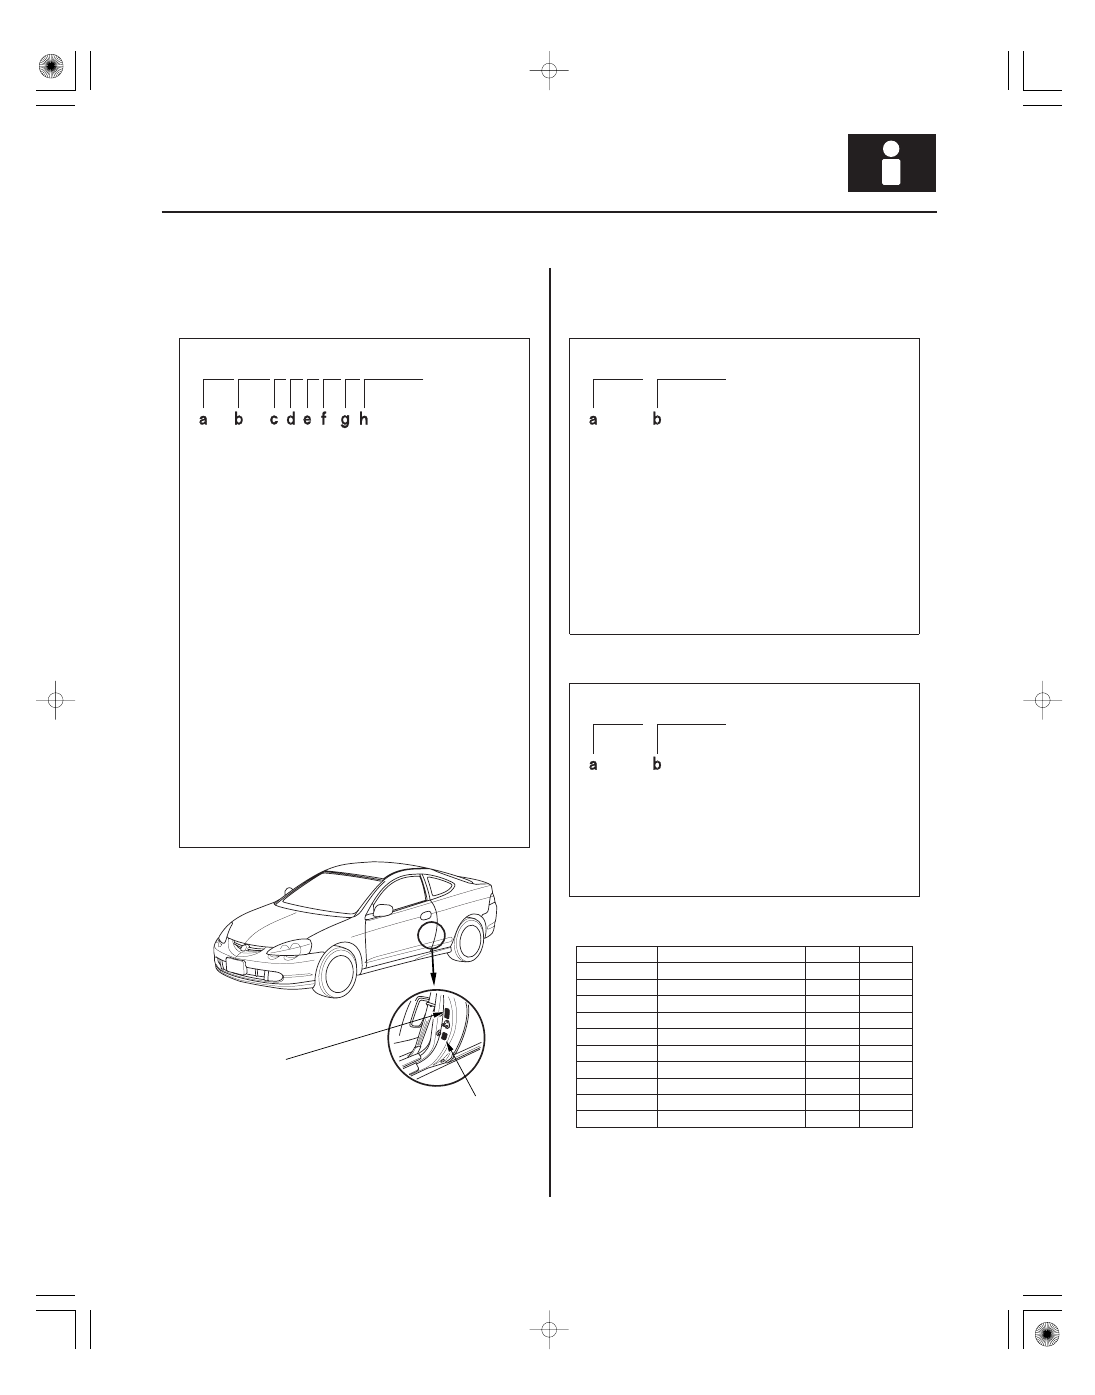 Acura RSX Honda Integra  Manual - part 2